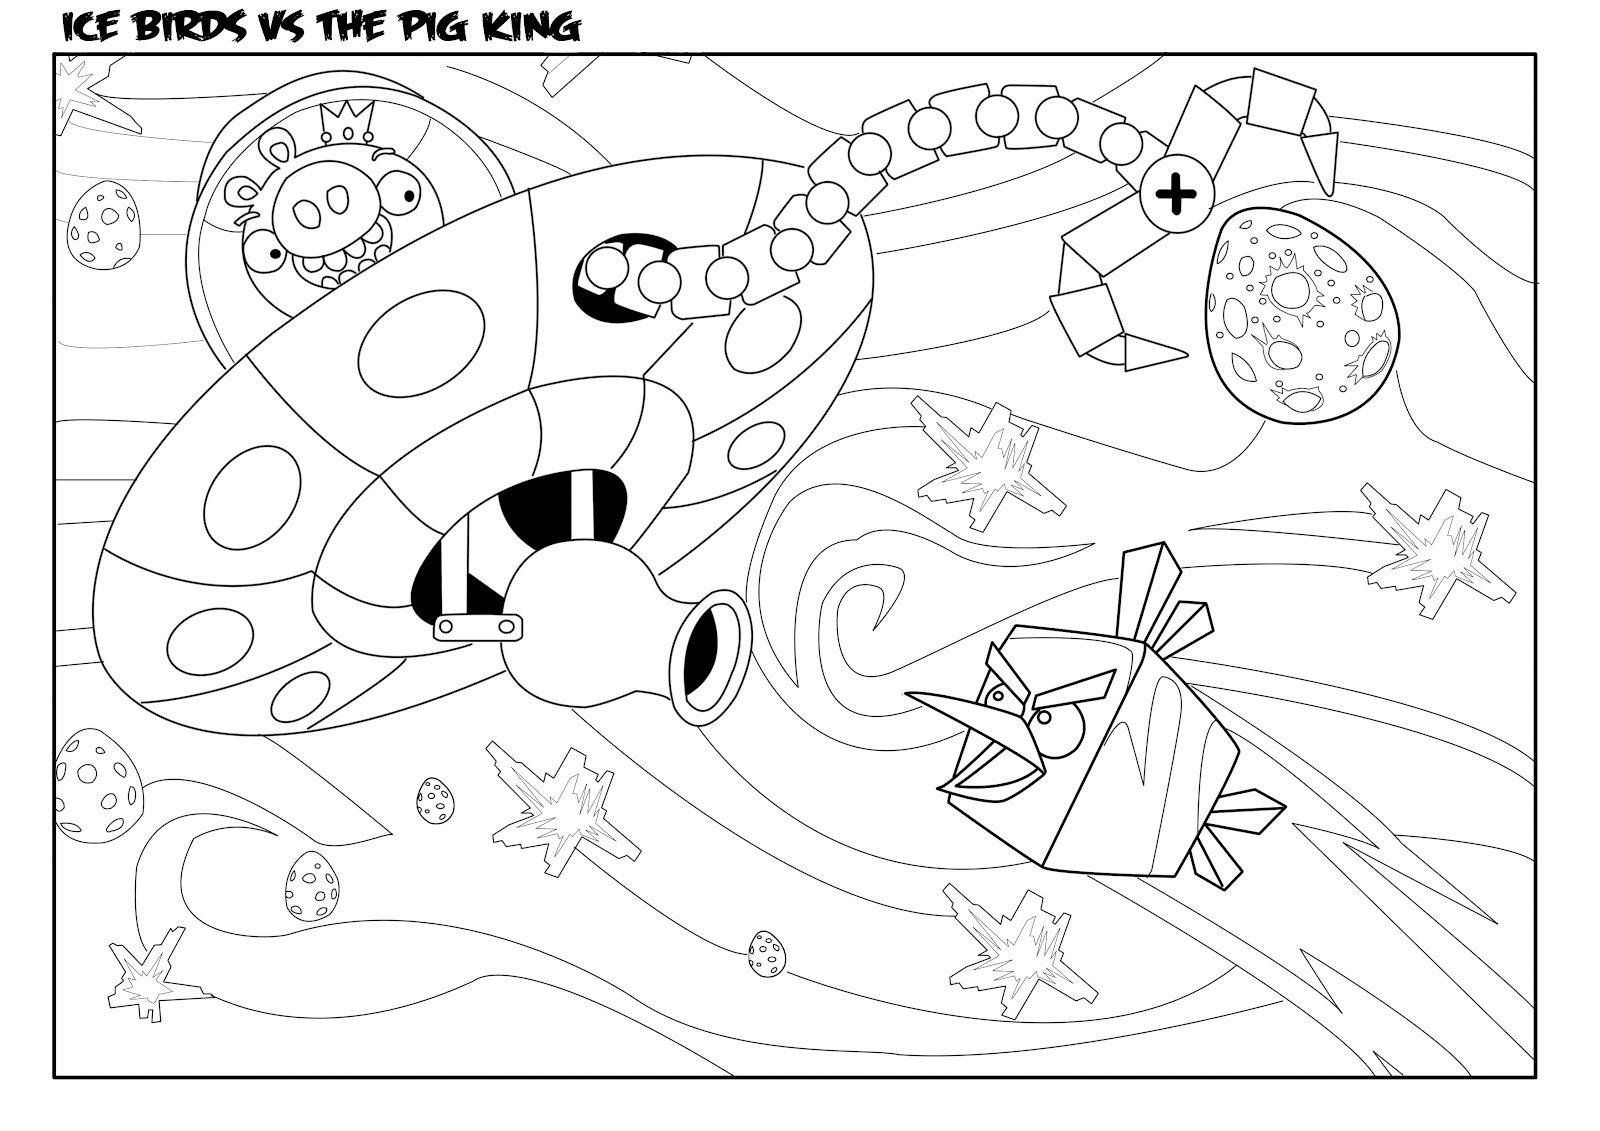 Dibujo para colorear de Angry Birds Space : Ice Bird persigue a rey cerdo